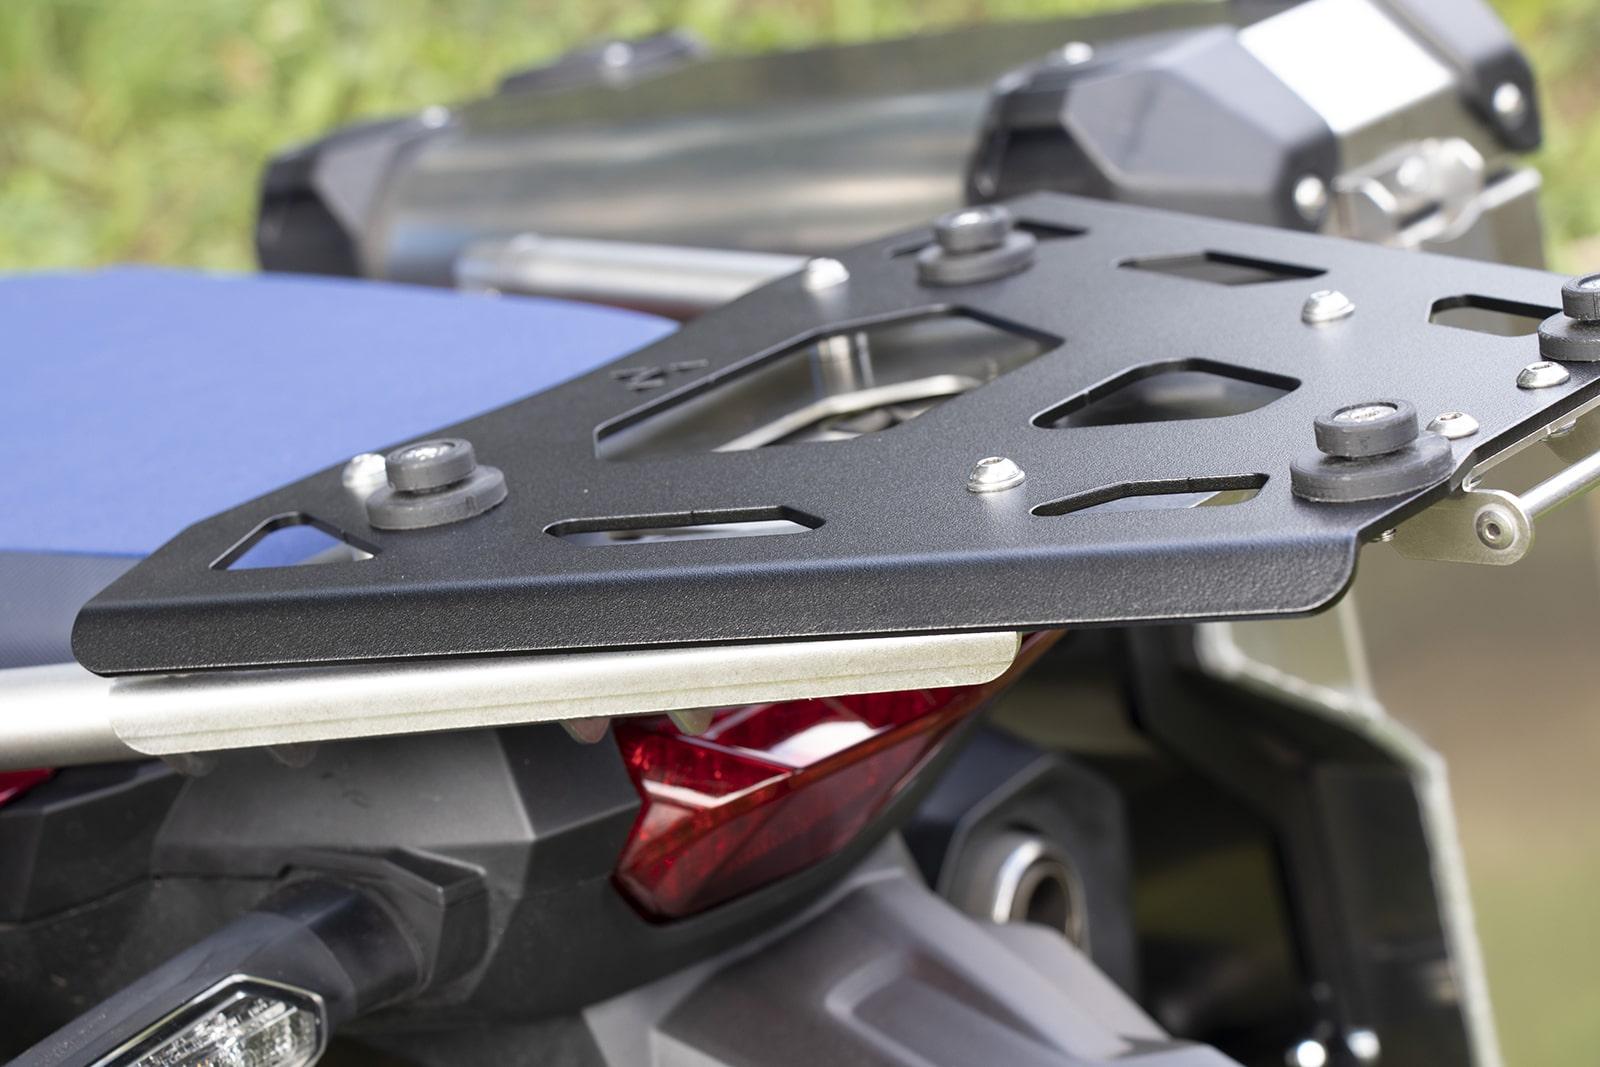 Top case 30L incl. top rack - Adventure Sport